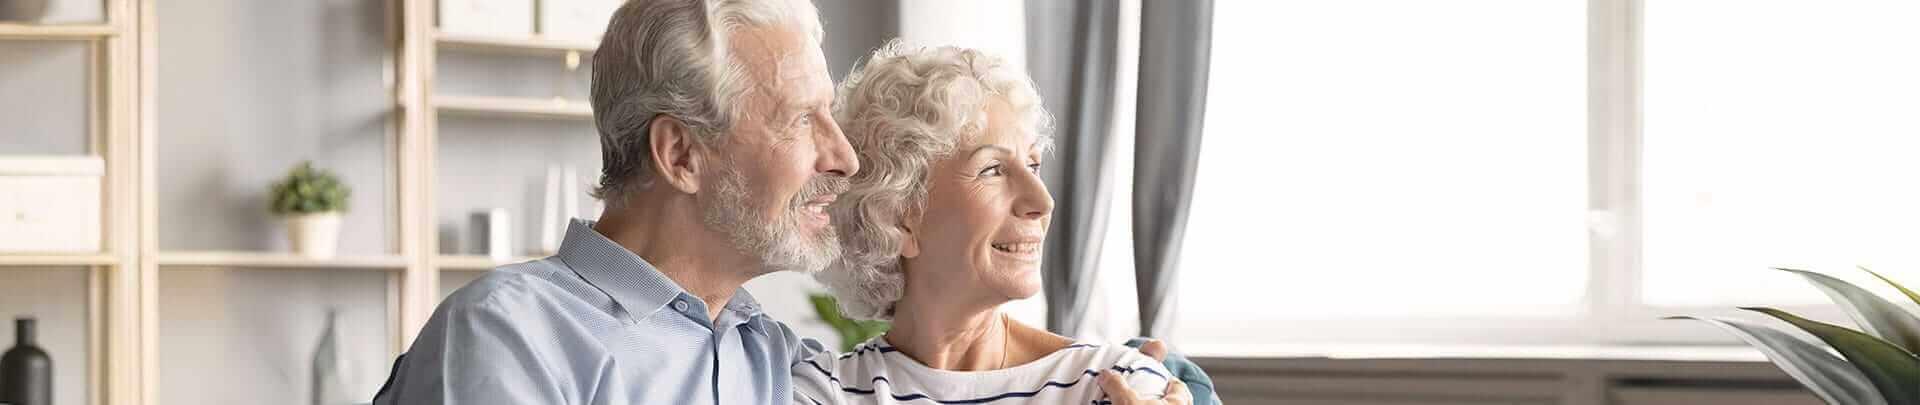 Seniorenpaar erbt